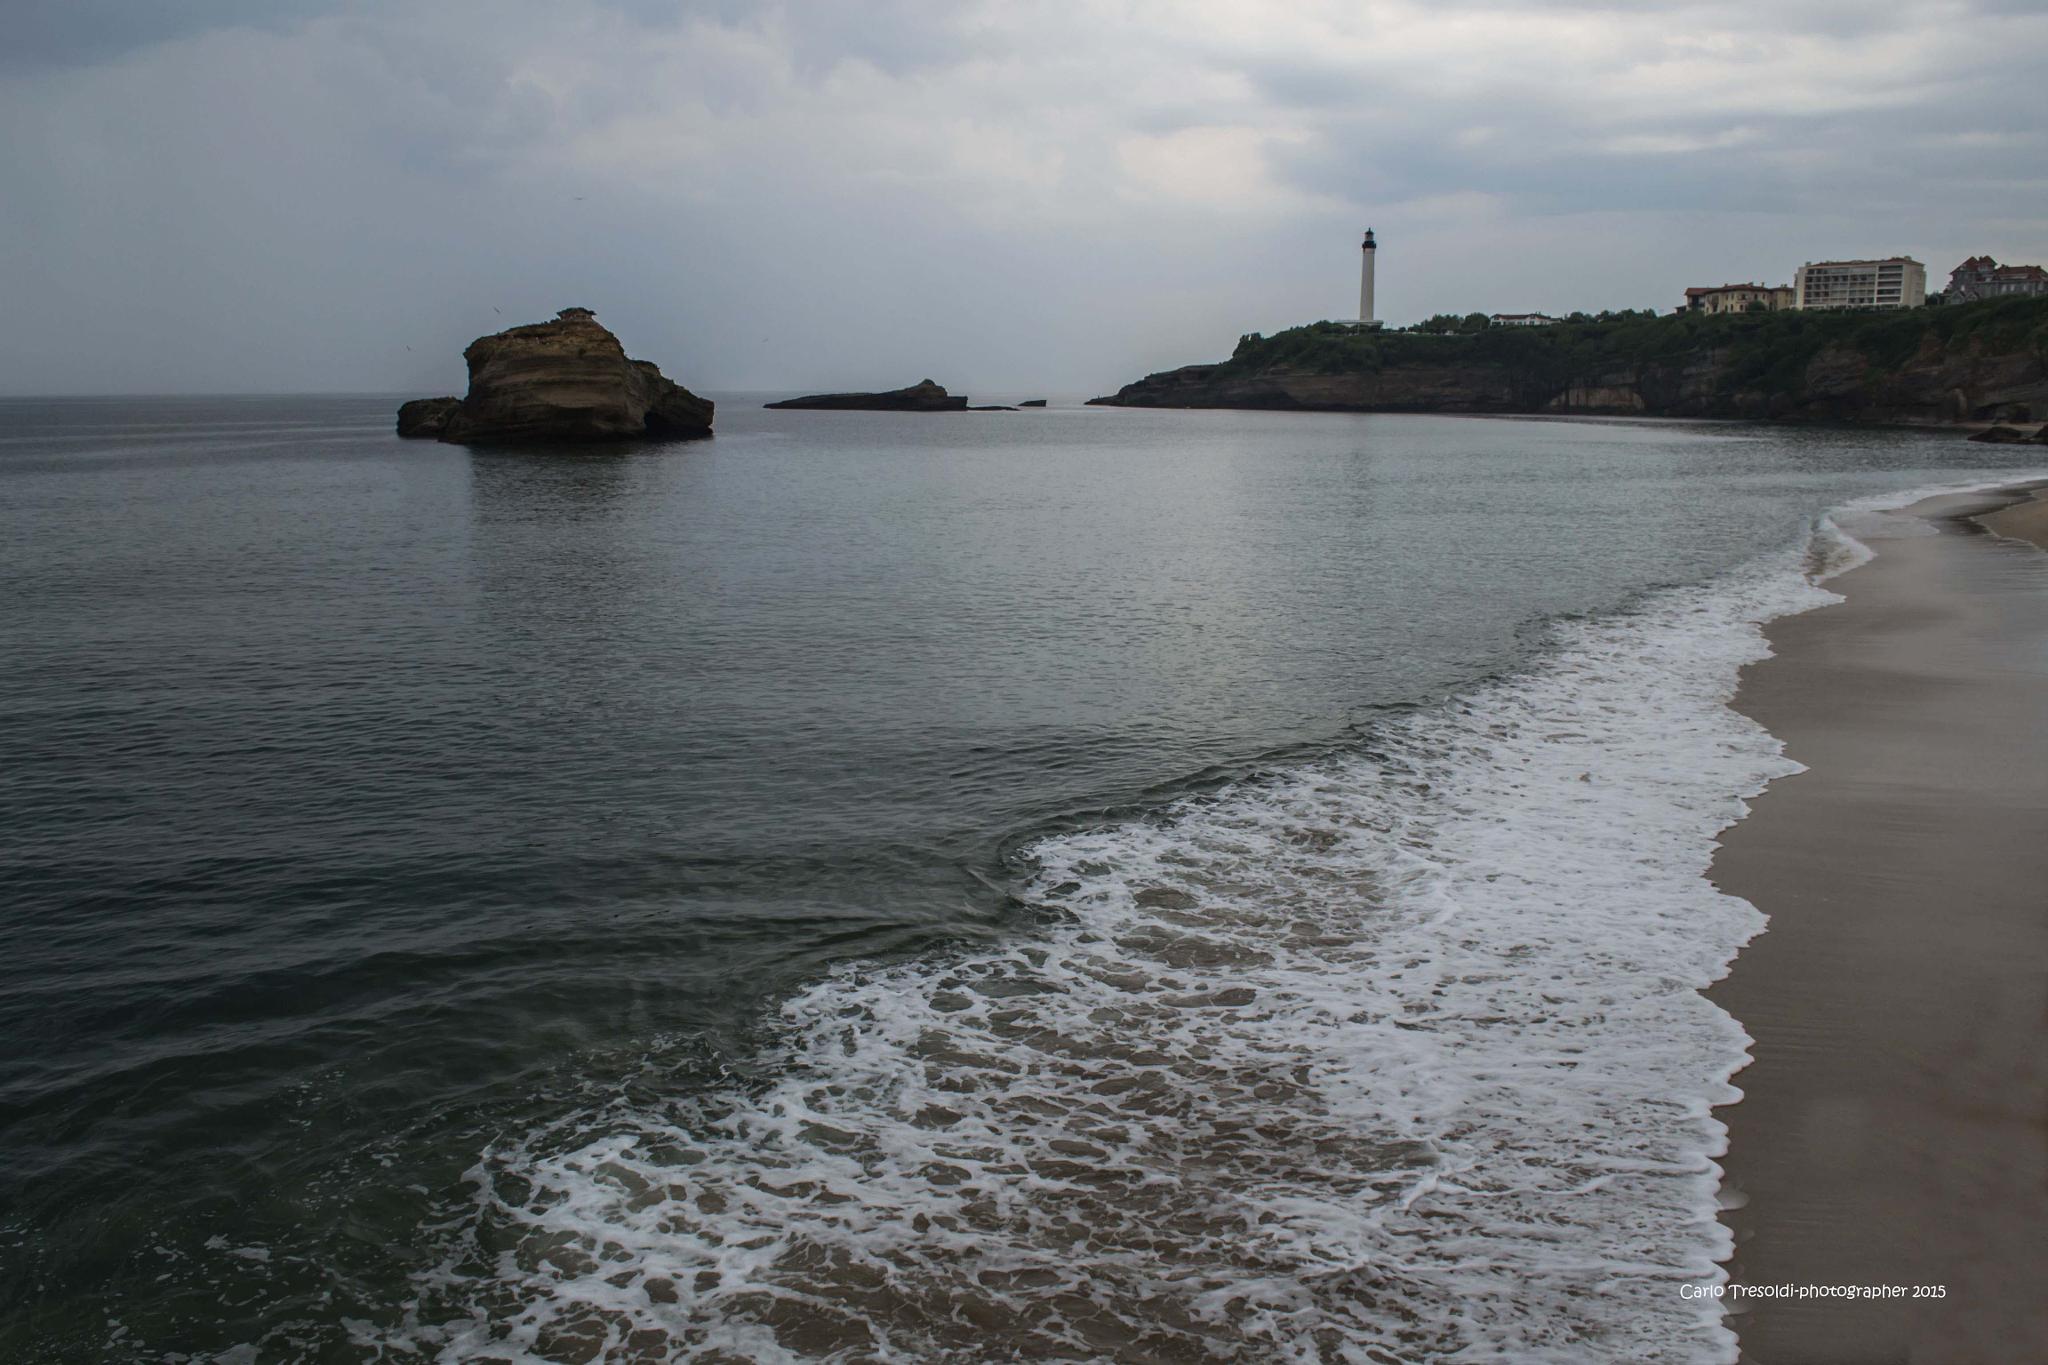 Temporale a Biarritz by carlo tresoldi